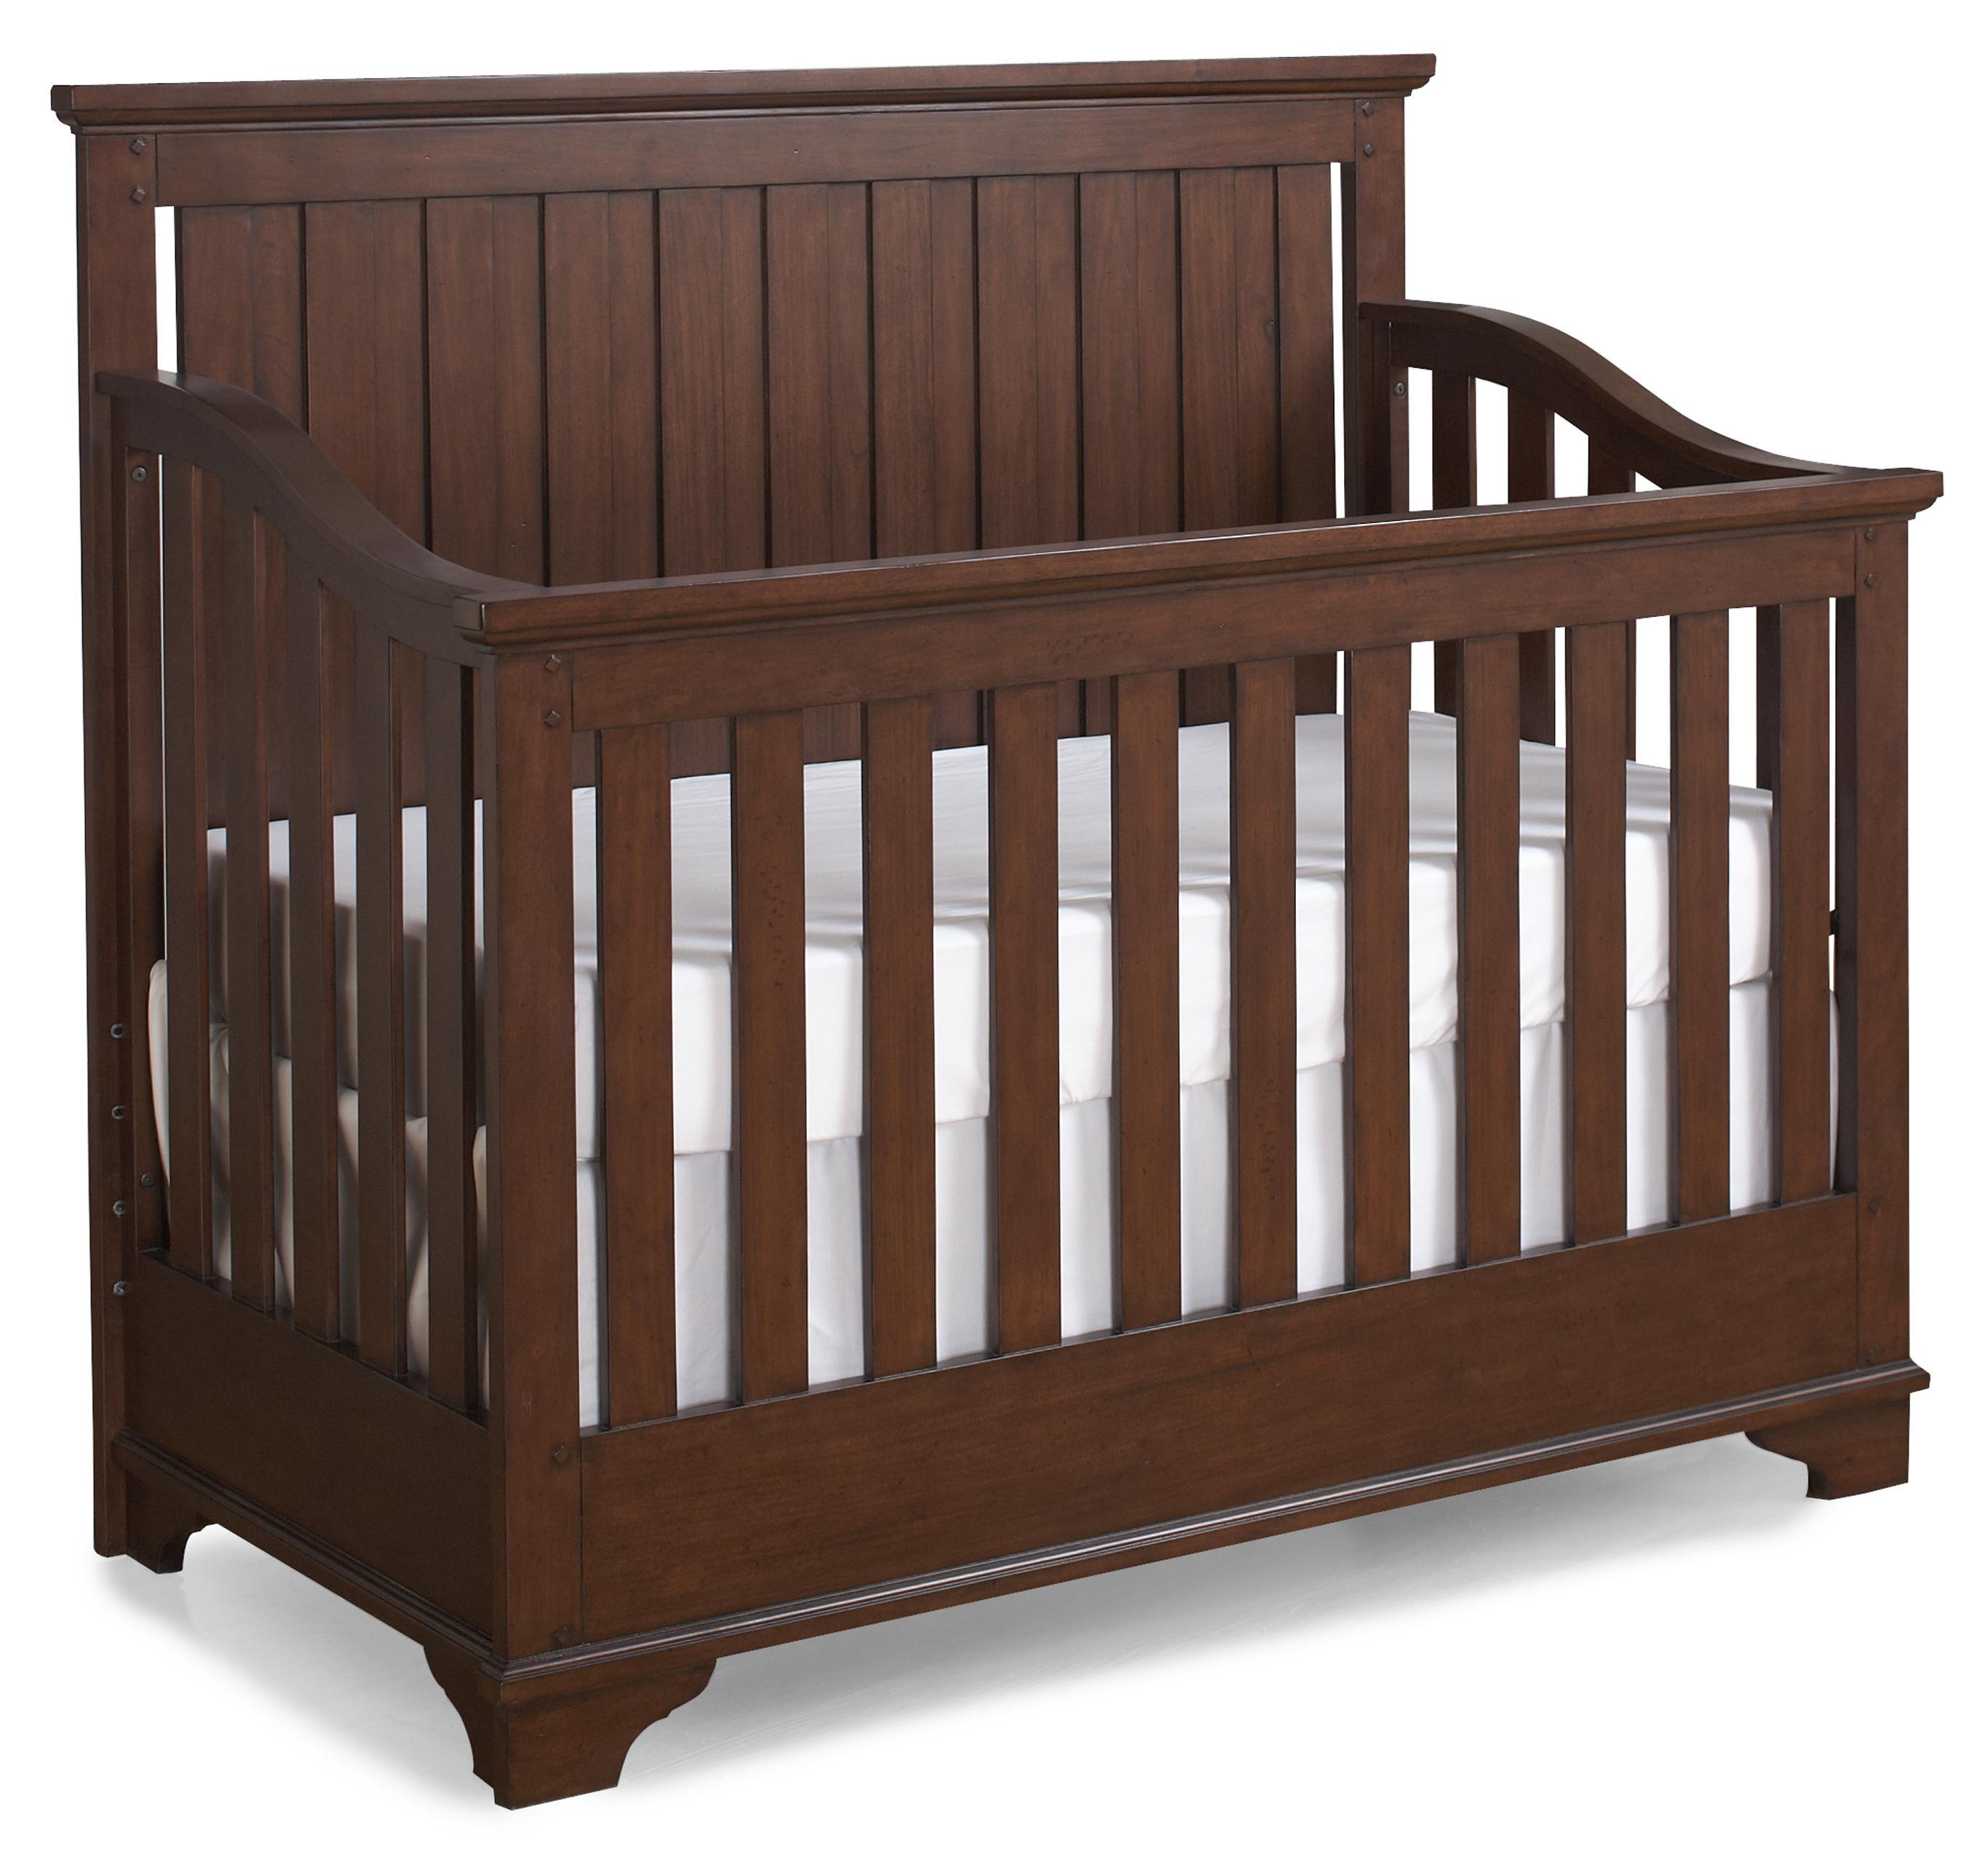 Legacy Classic Kids Dawsons Ridge Convertible Crib  - Item Number: 2960-8900